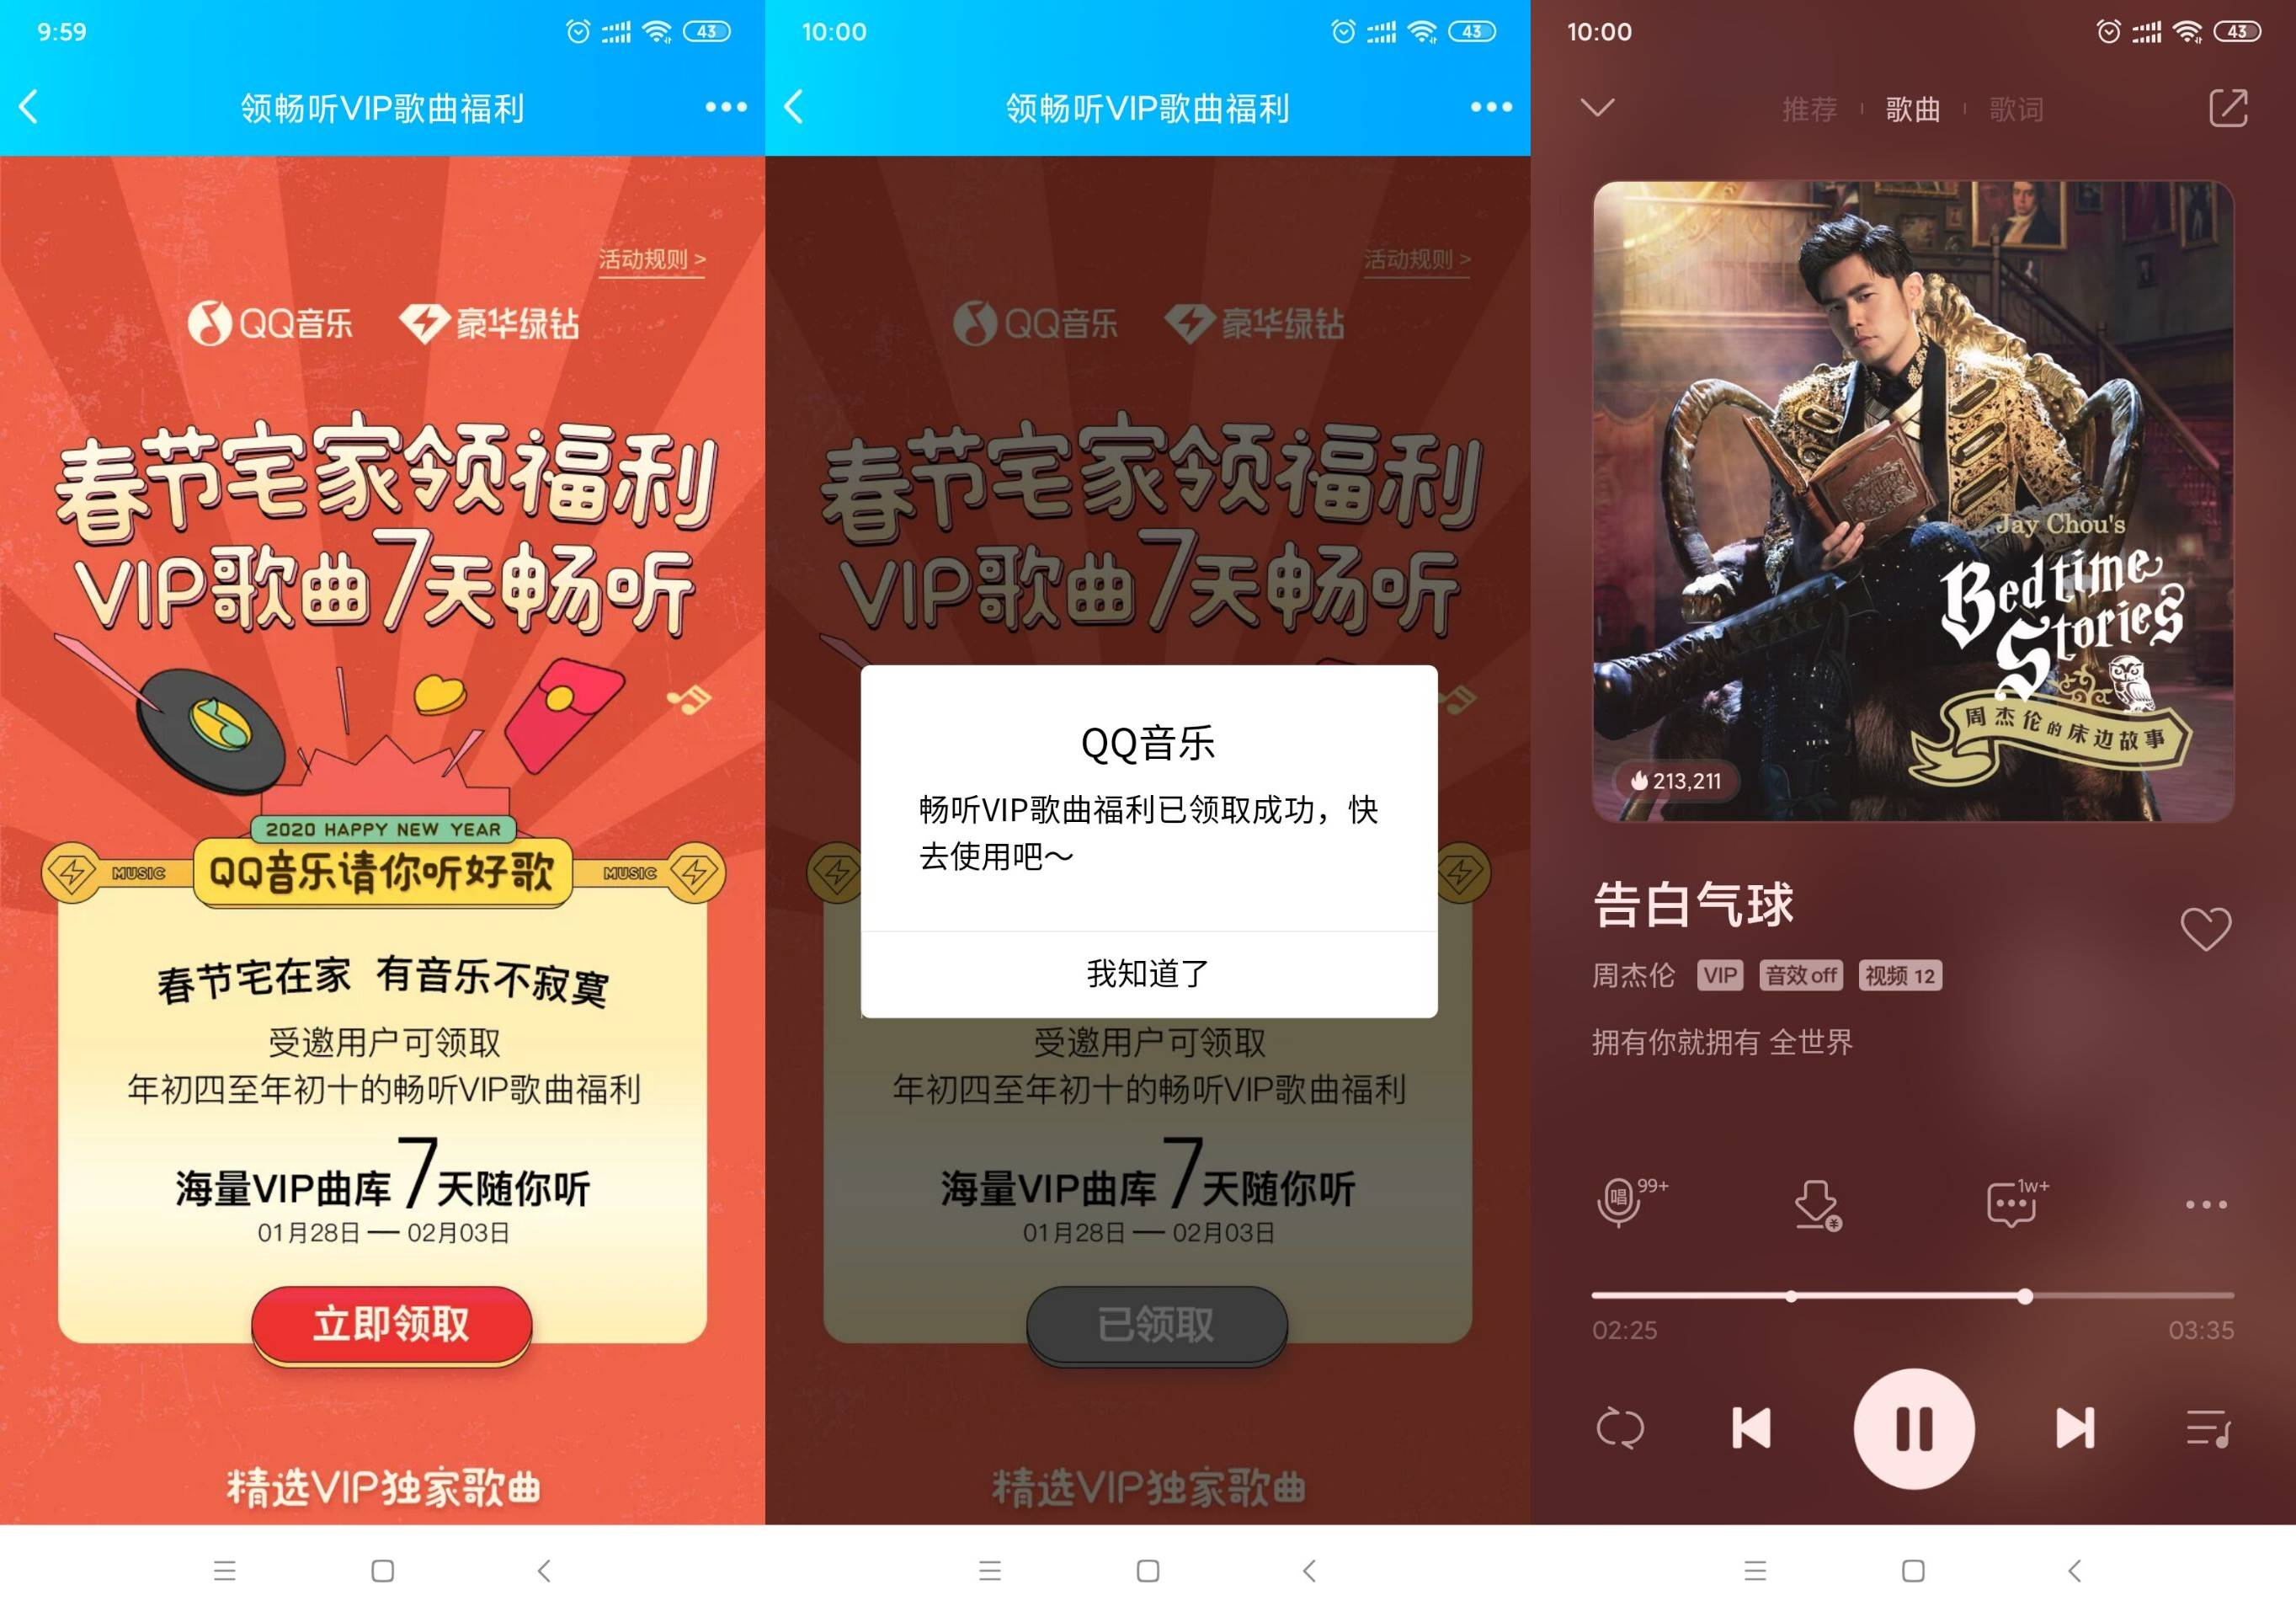 QQ音乐领7天VIP听歌特权